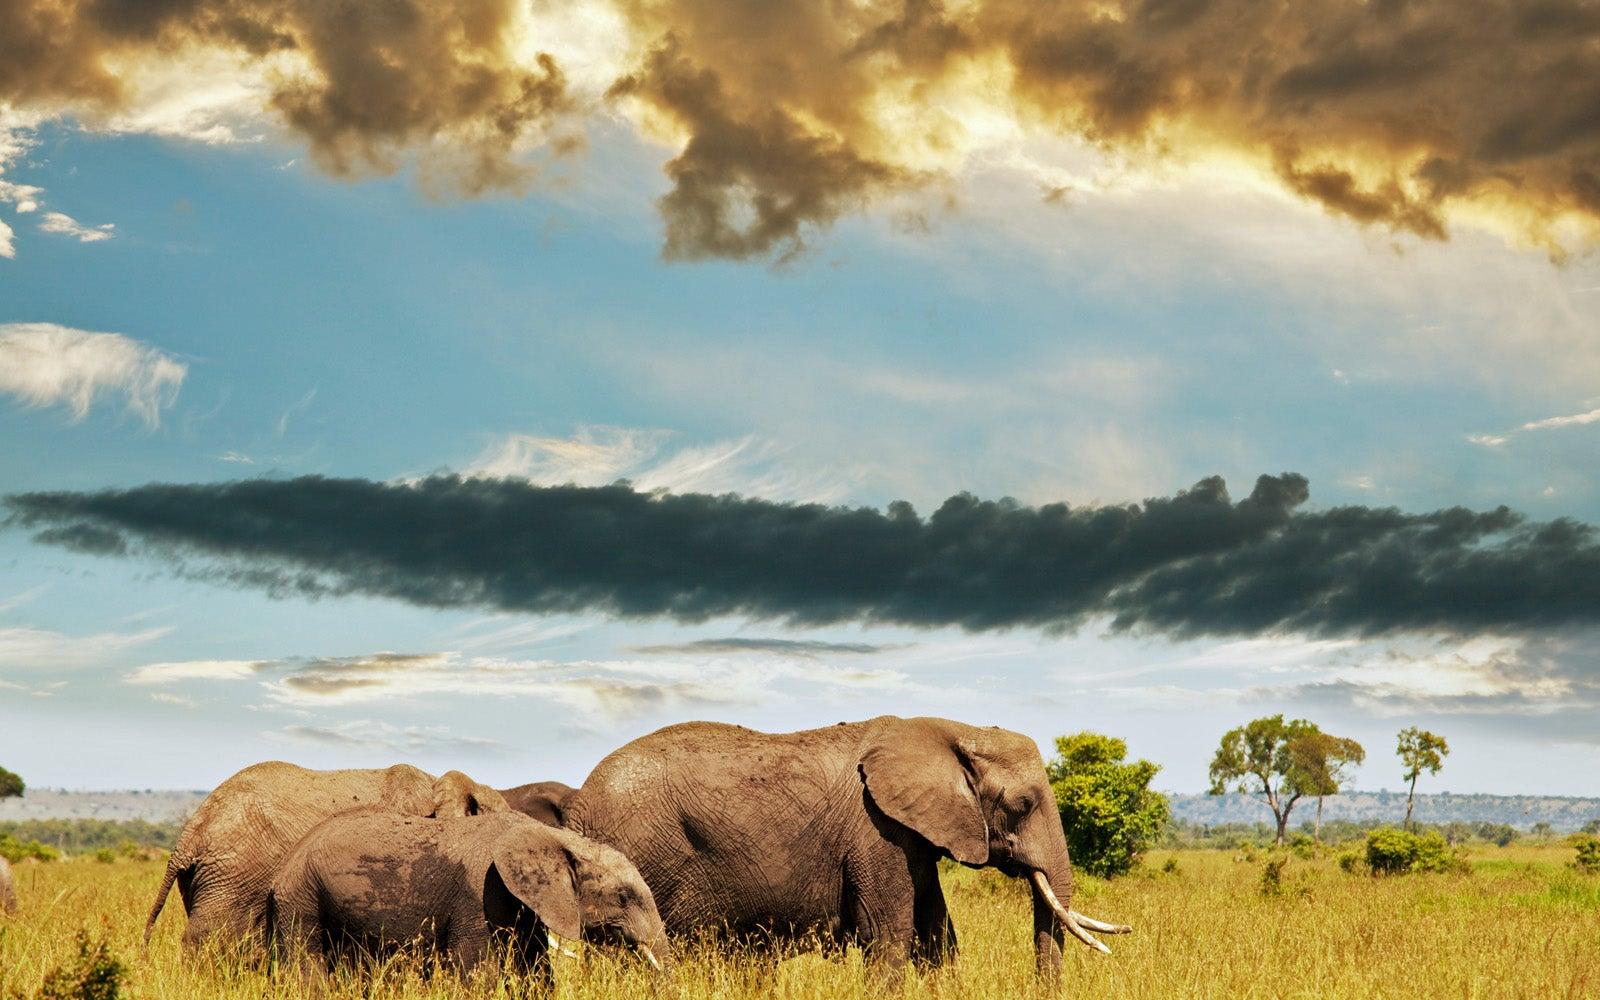 ein gewitter in 240 kilometer entfernung elefanten sp ren. Black Bedroom Furniture Sets. Home Design Ideas